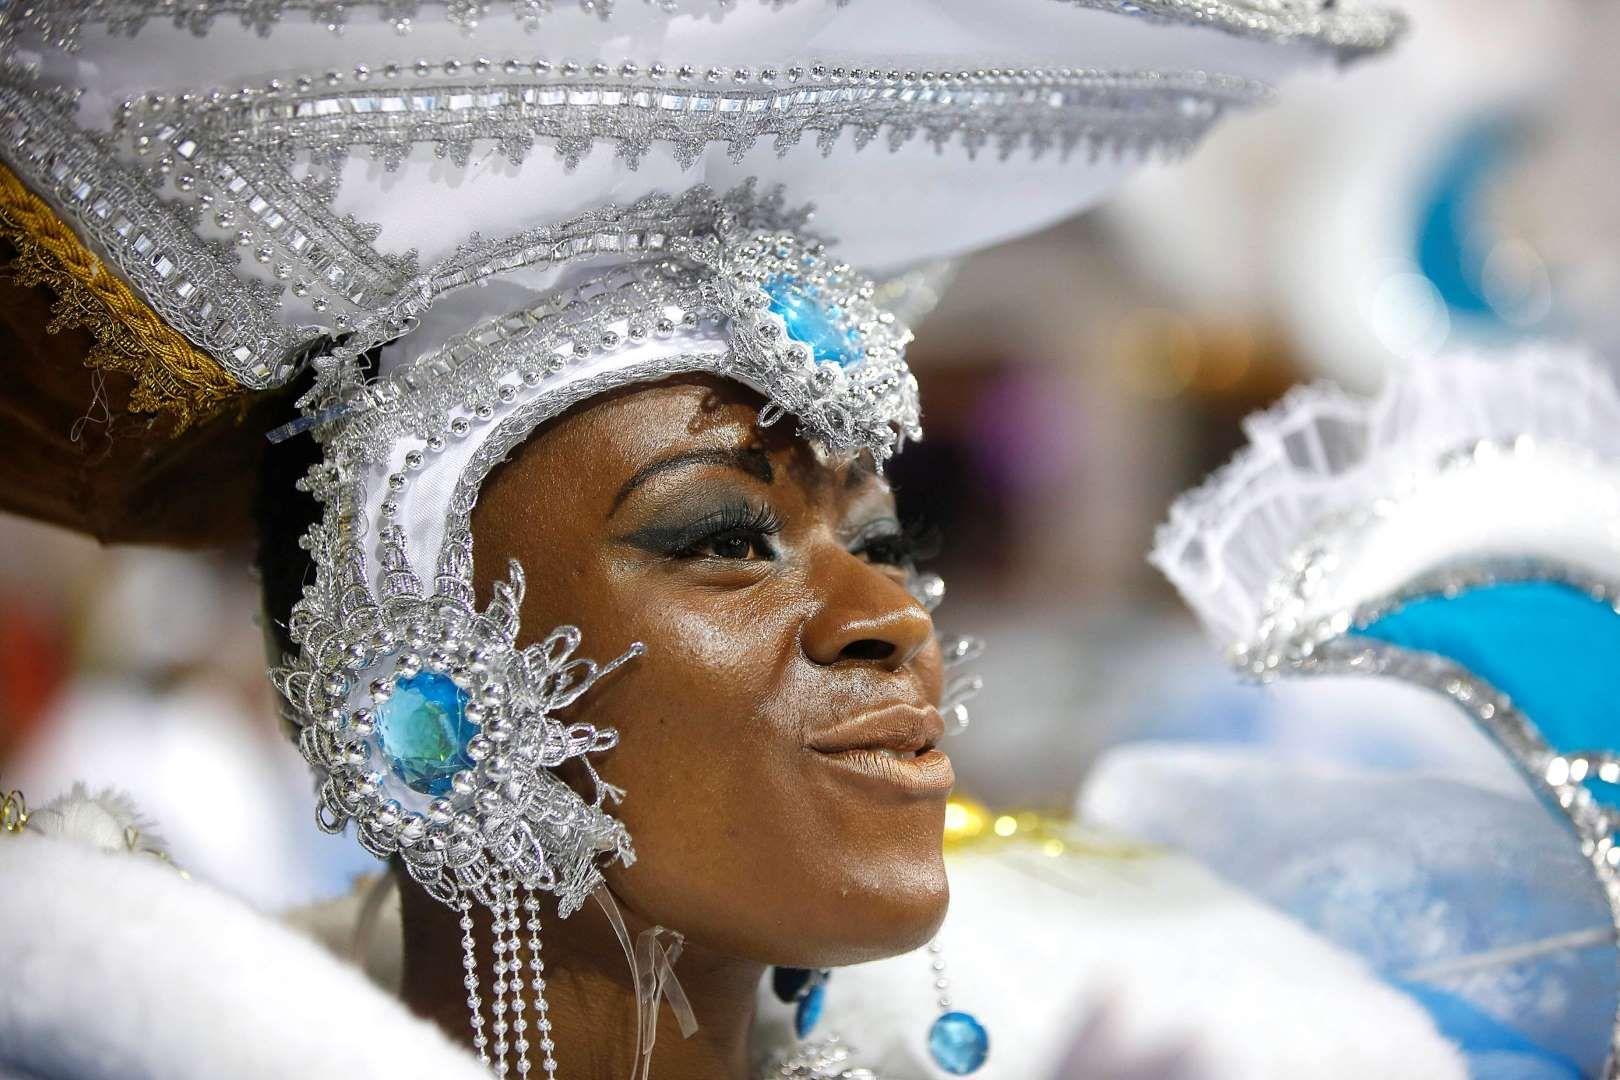 A dancer from the Nene de Vila Matilde samba school performs during a carnival parade in Sao Paulo, Brazil